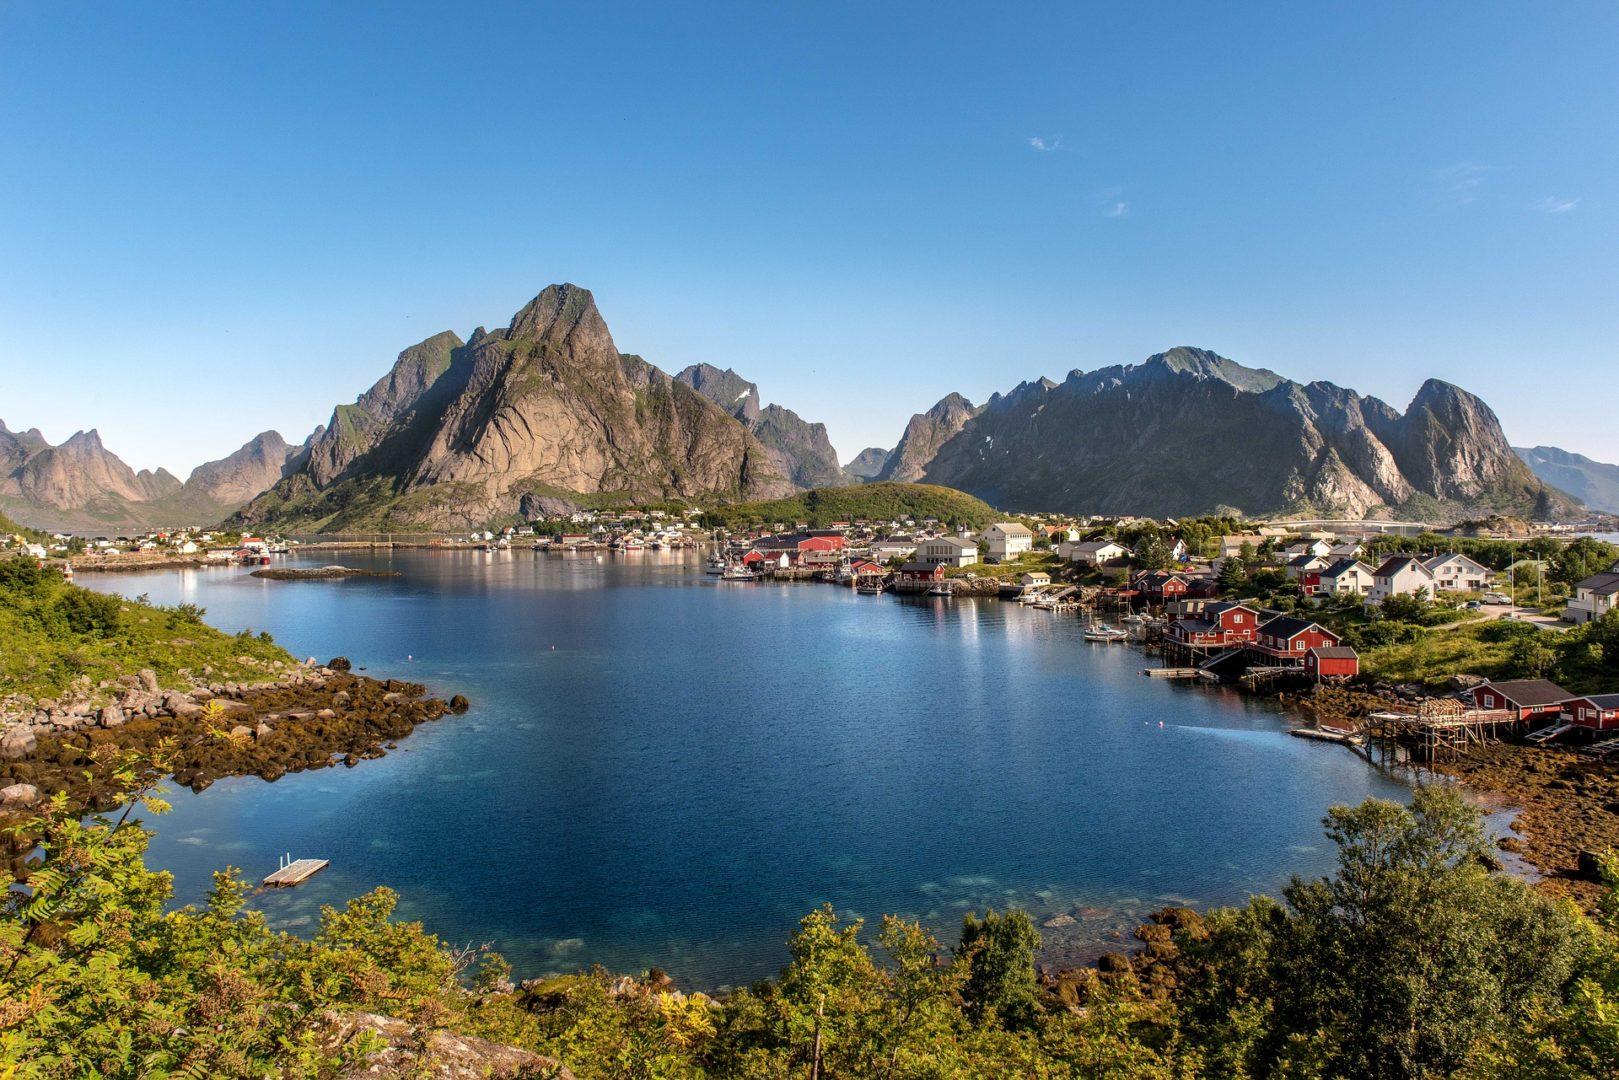 Cyclotourisme dans les Lofoten en Norvège